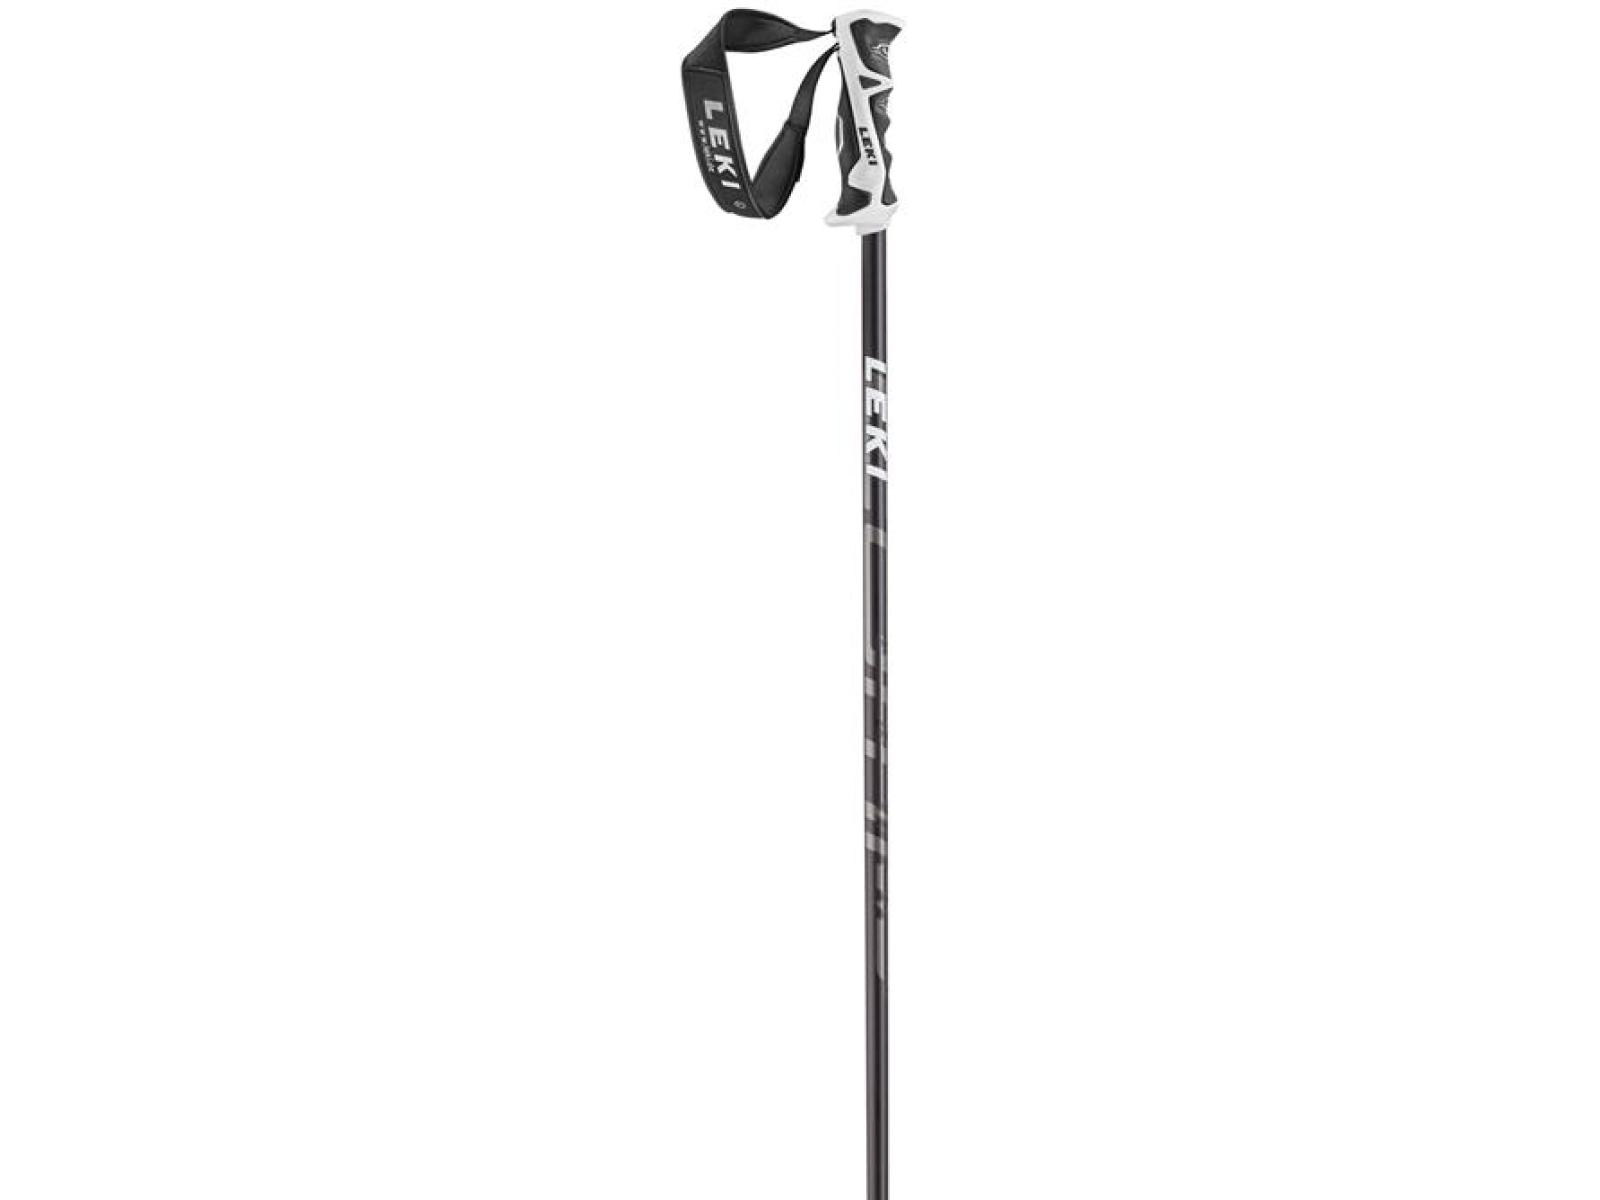 Leki Comp 16 C Délka holí: 115 cm 2016/2017